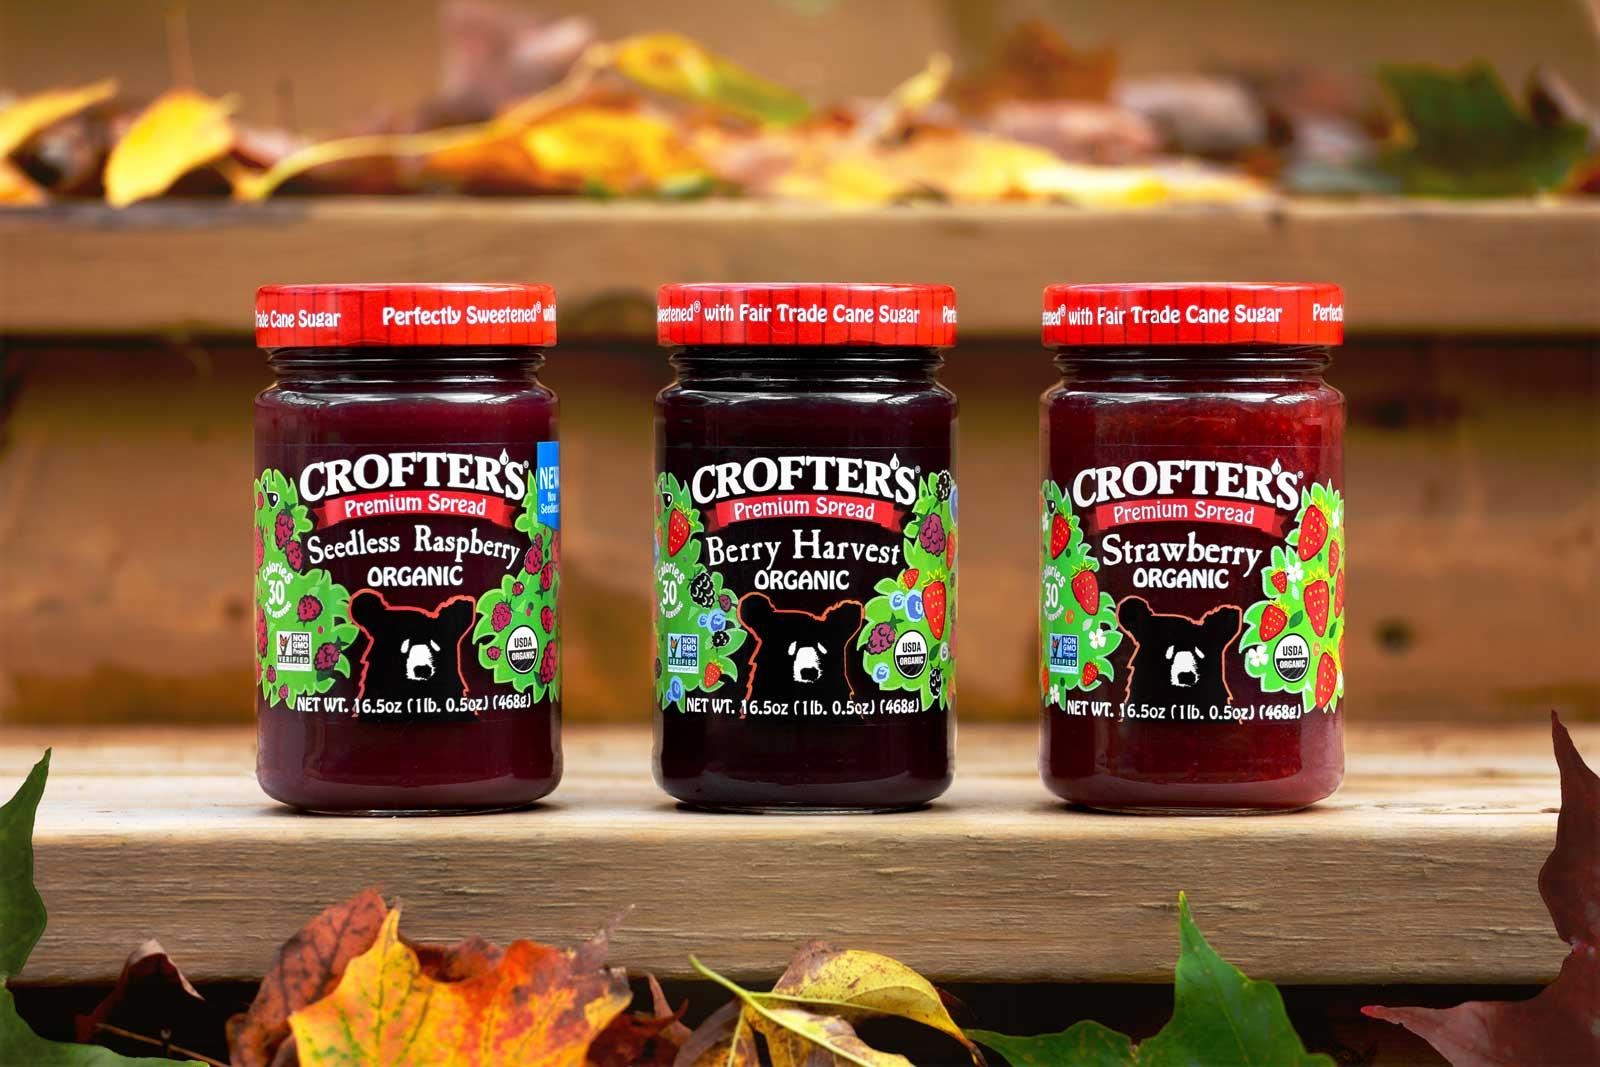 Crofter's Organics Premium Spread